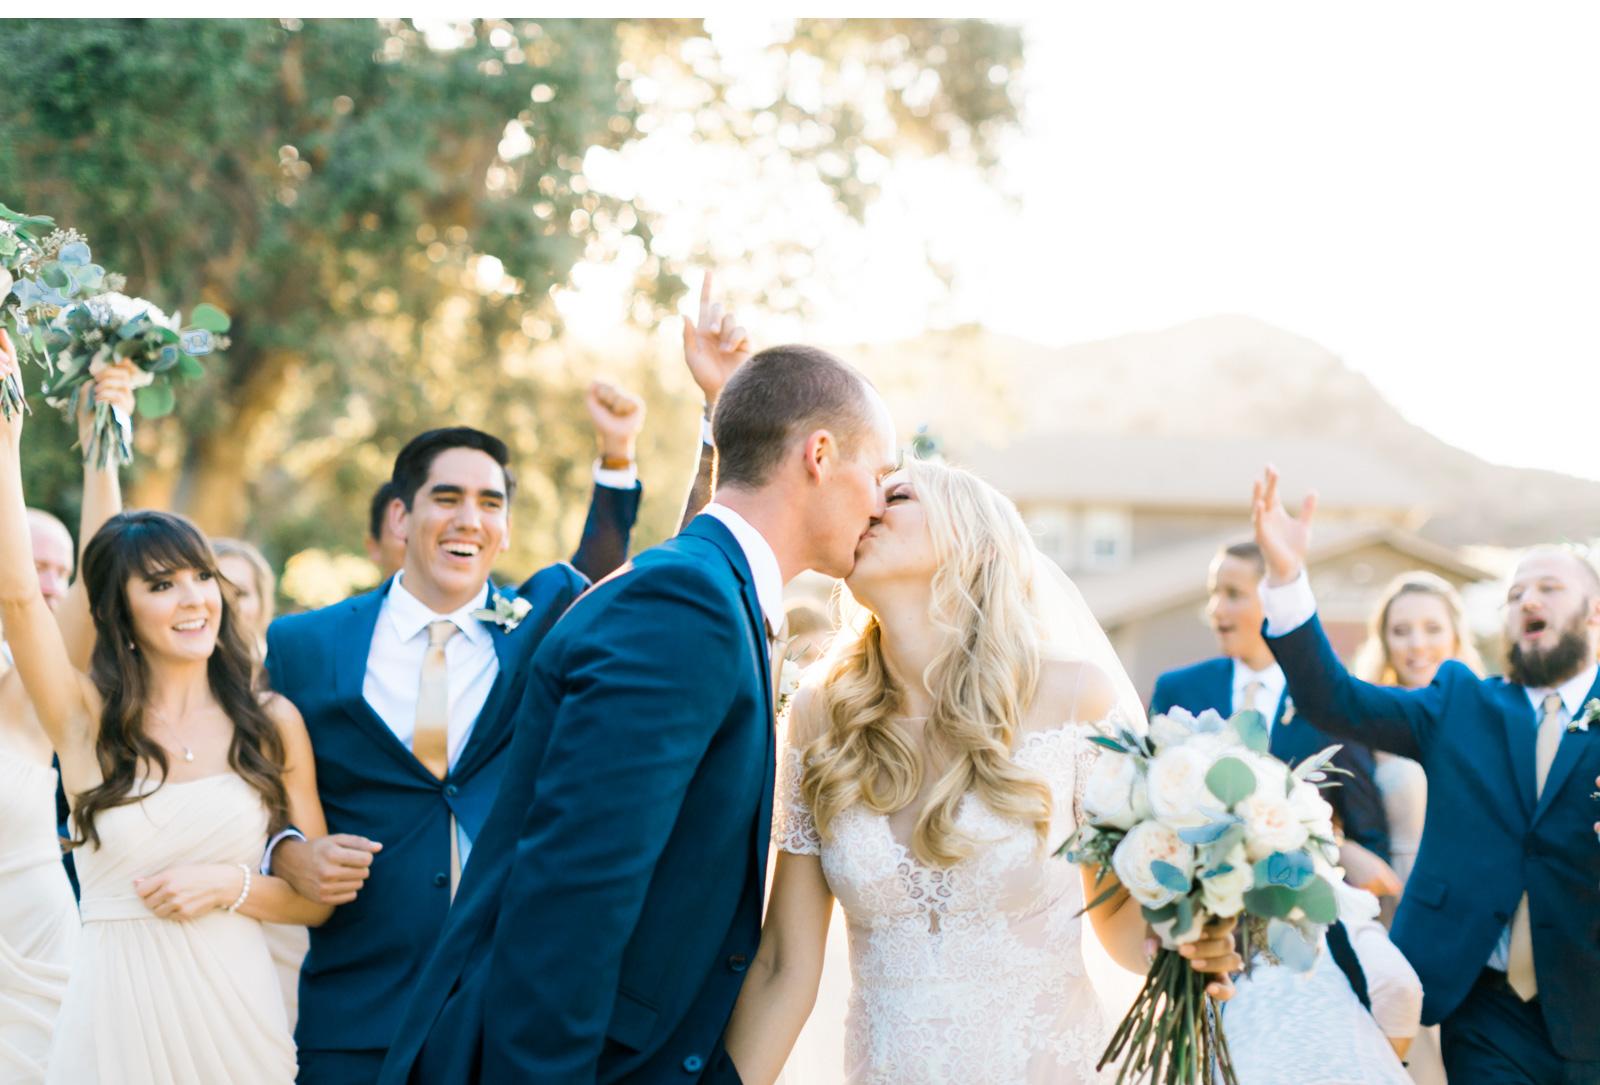 Style-Me-Pretty-Wedding-Photographer-Natalie-Schutt-Photography-Calfornia-San-Luis-Obispo_15.jpg